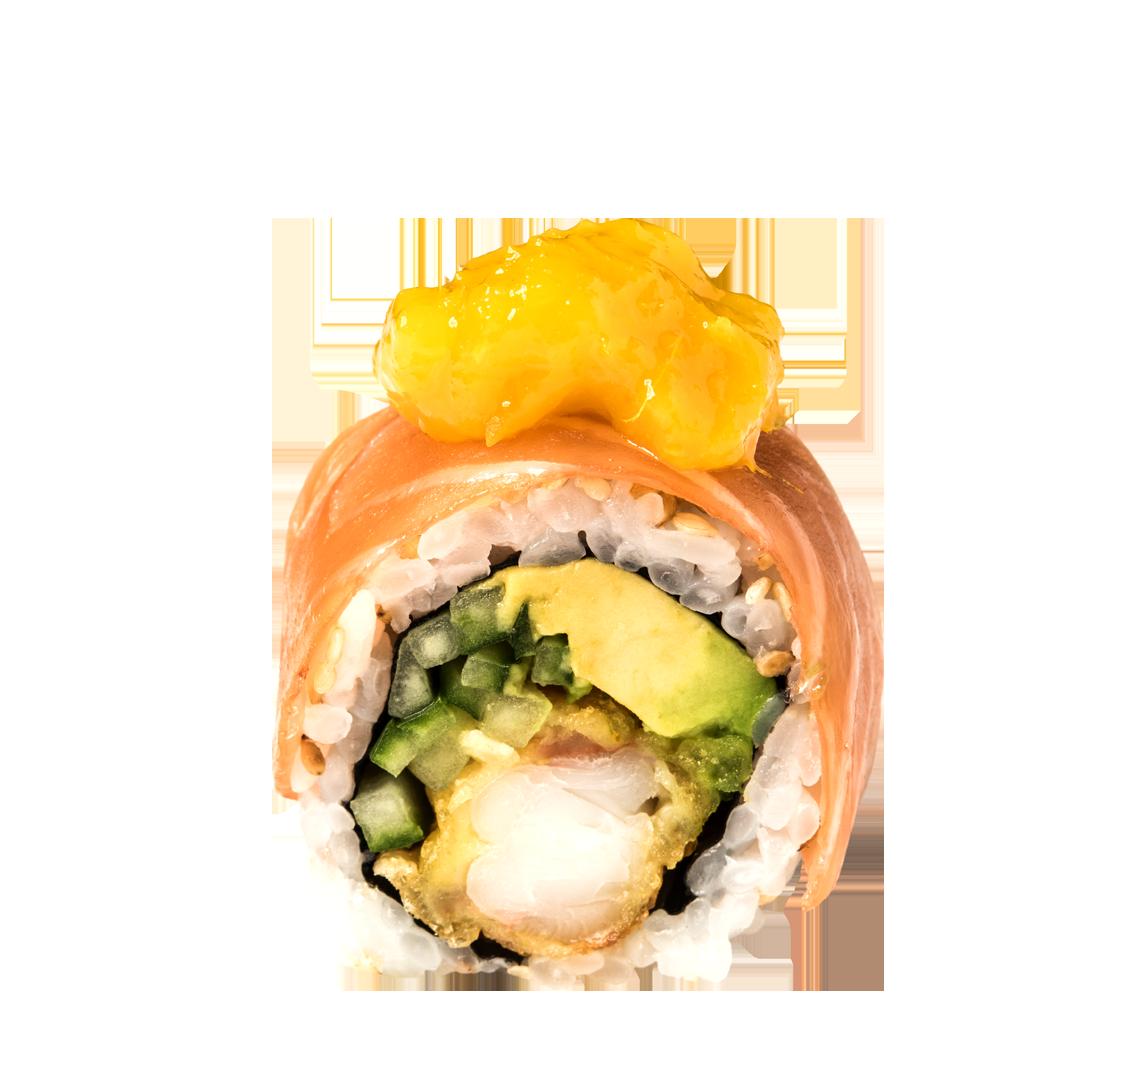 Garnelen Tempura, Gurke, Avocado, Lachs Sashimi, Mango title=Mango Salmon Roll </br>11,00 €